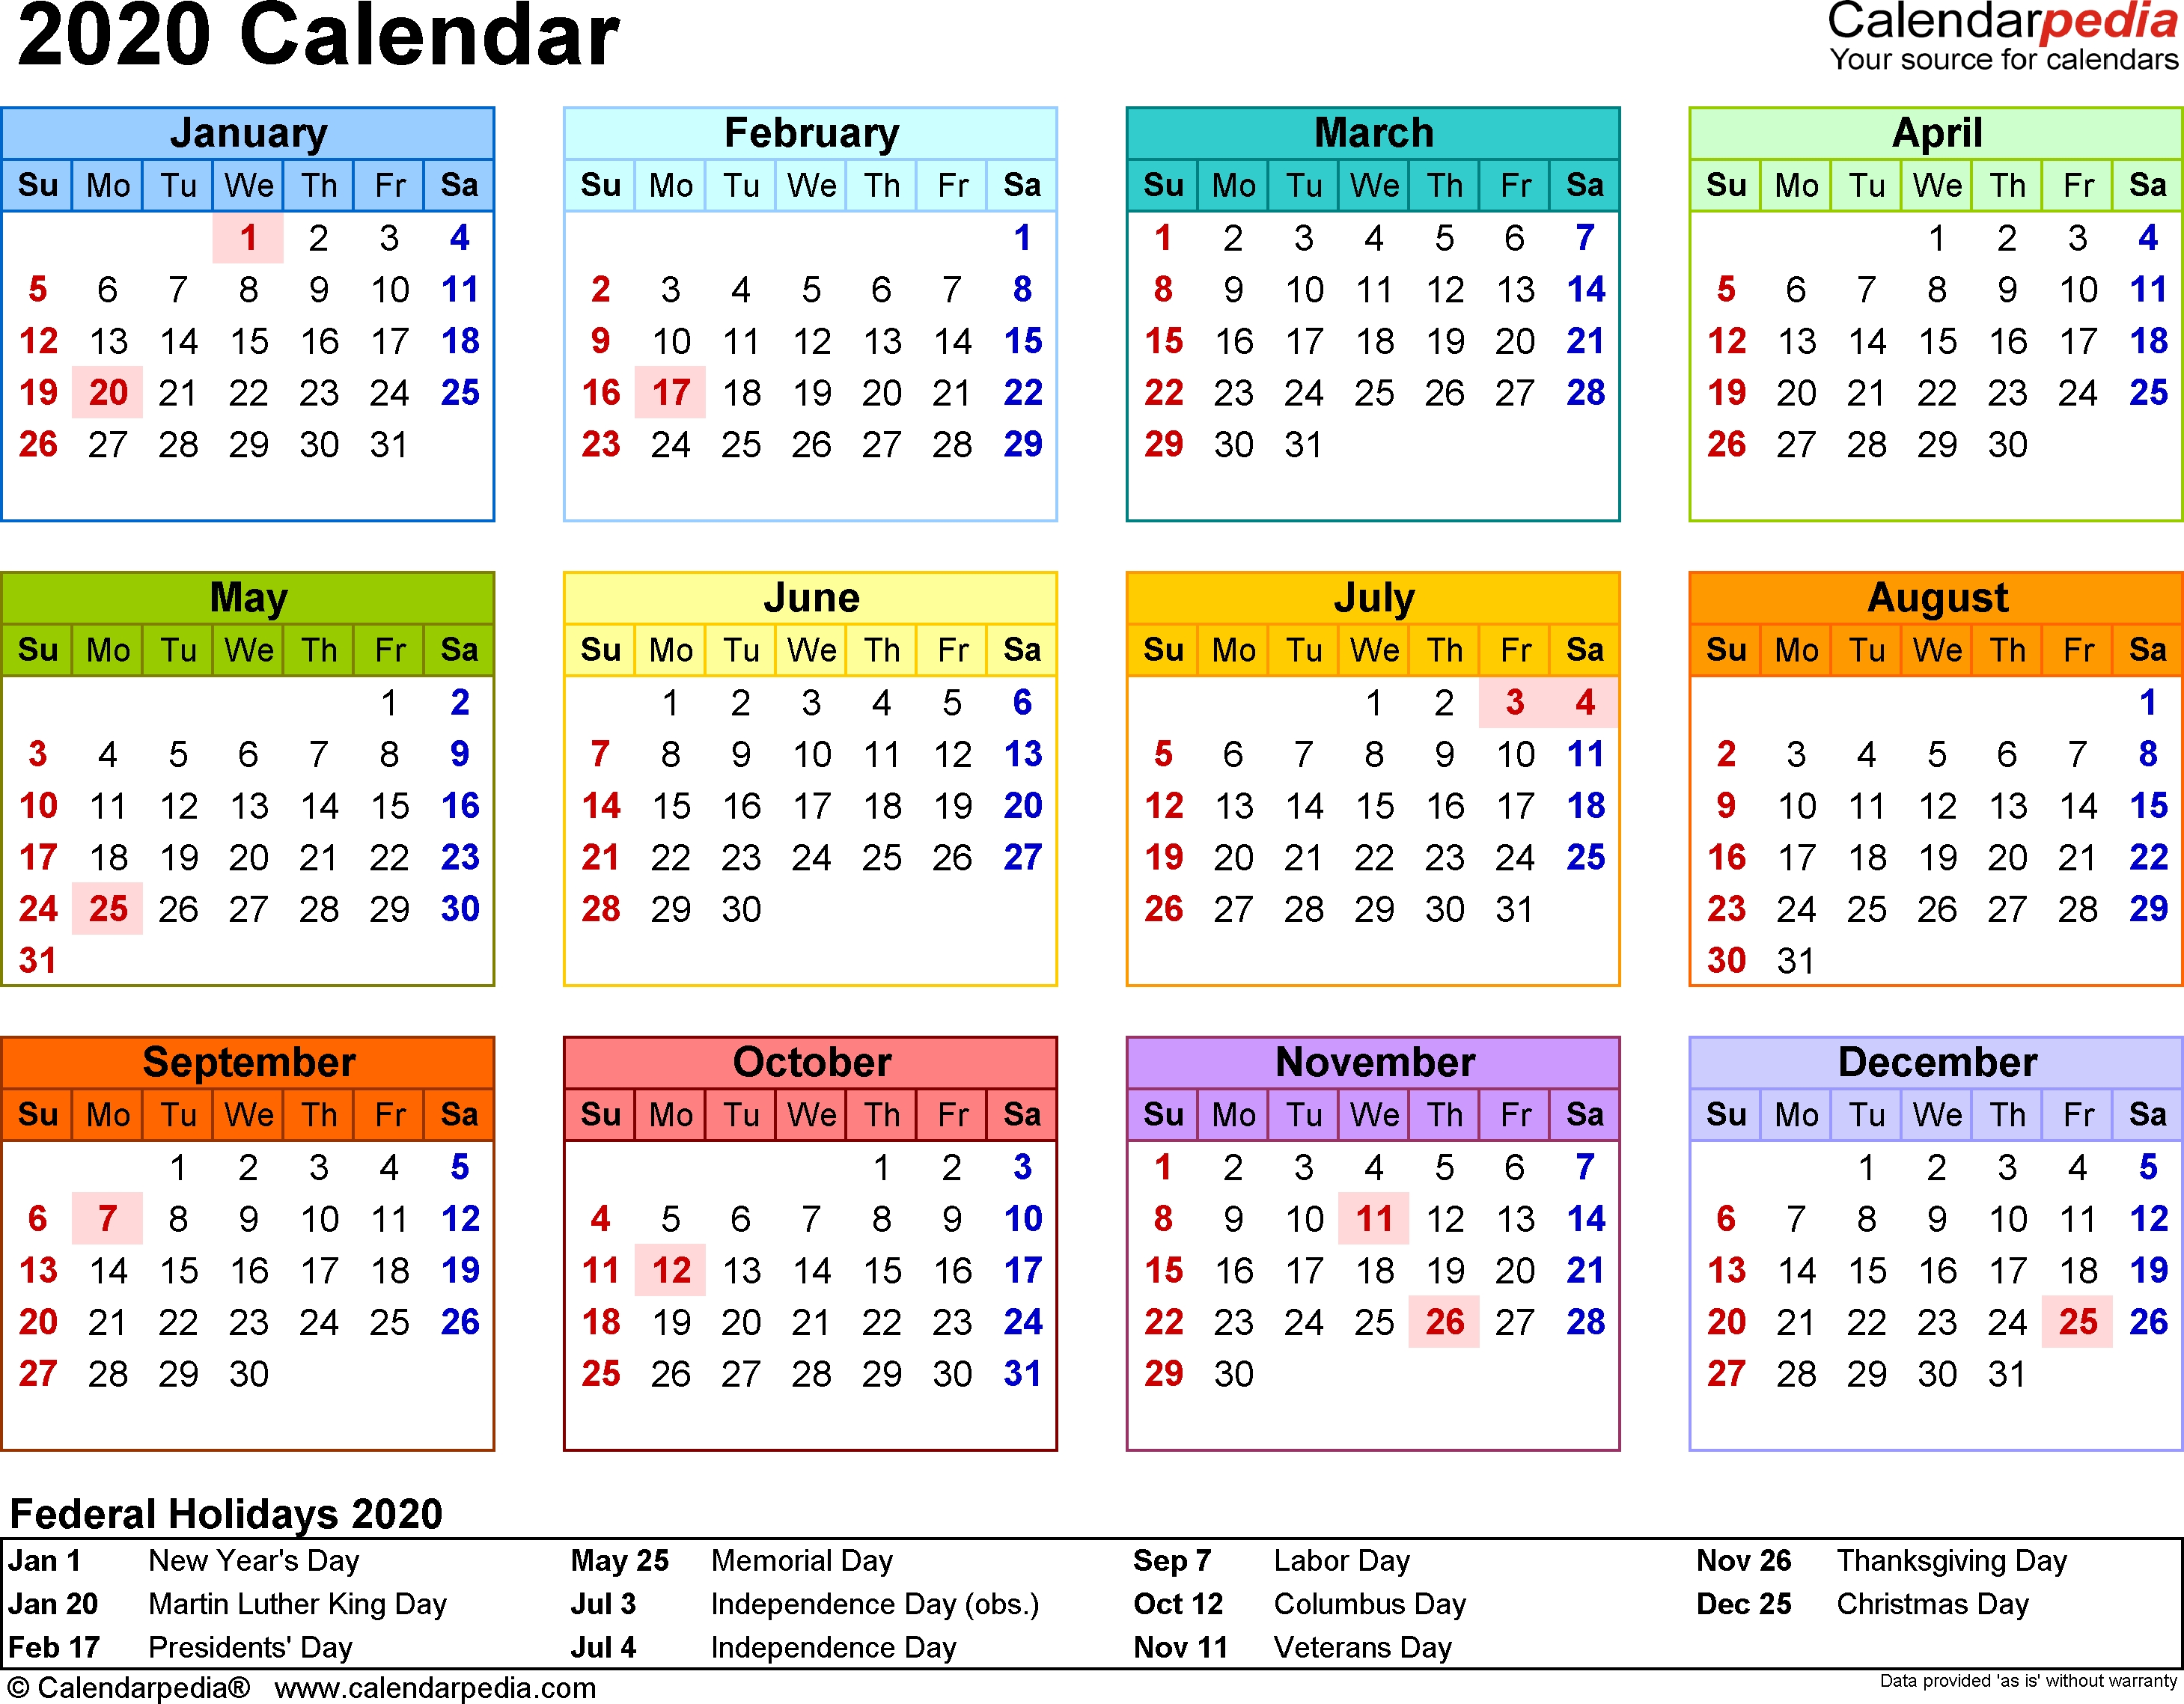 2020 Calendar - 17 Free Printable Word Calendar Templates intended for Printable Calendar For 2020 To Type On